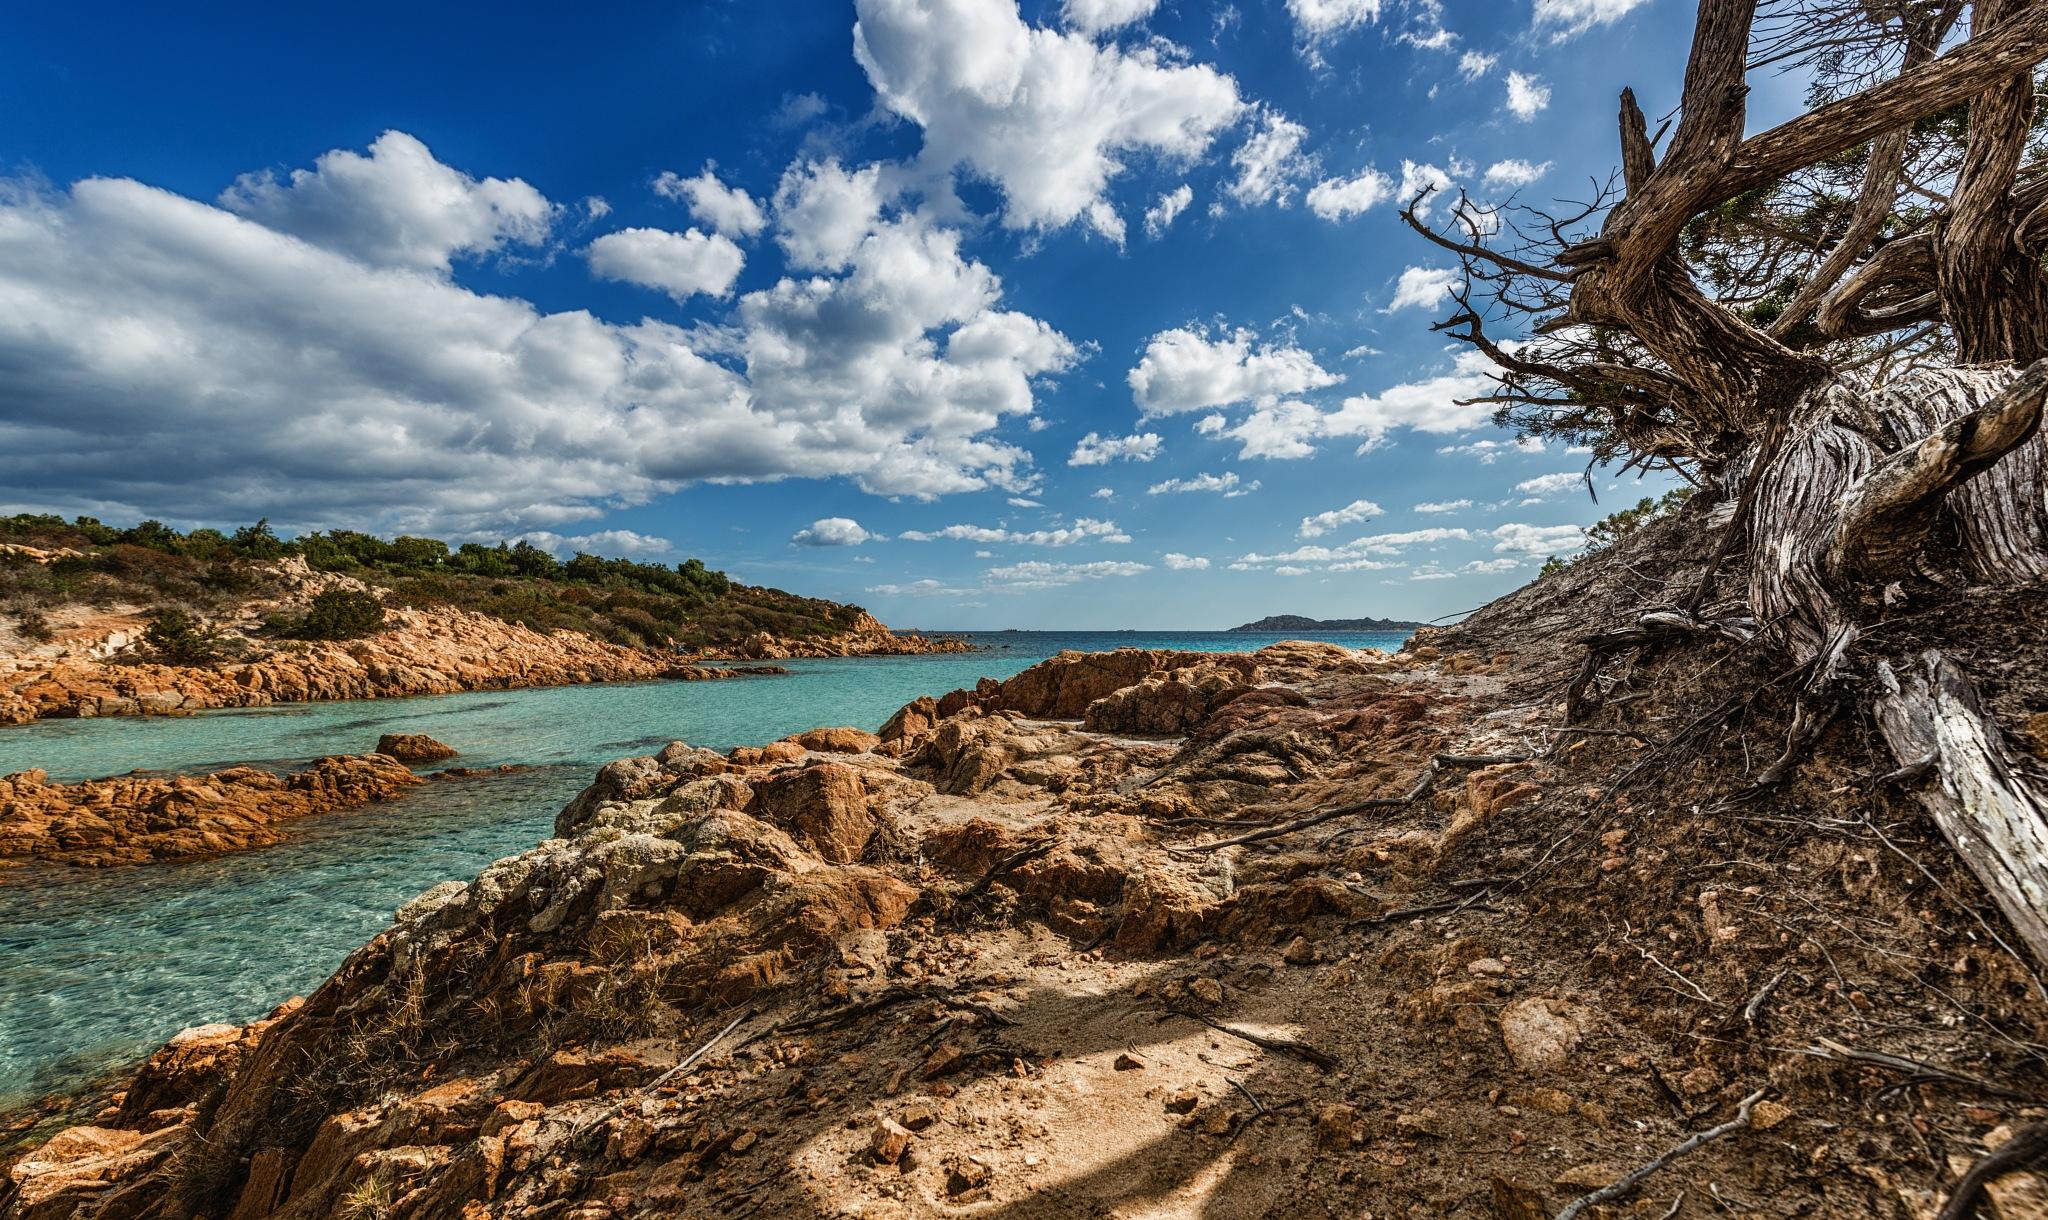 Beach juniper by Antonello Madau Antofender